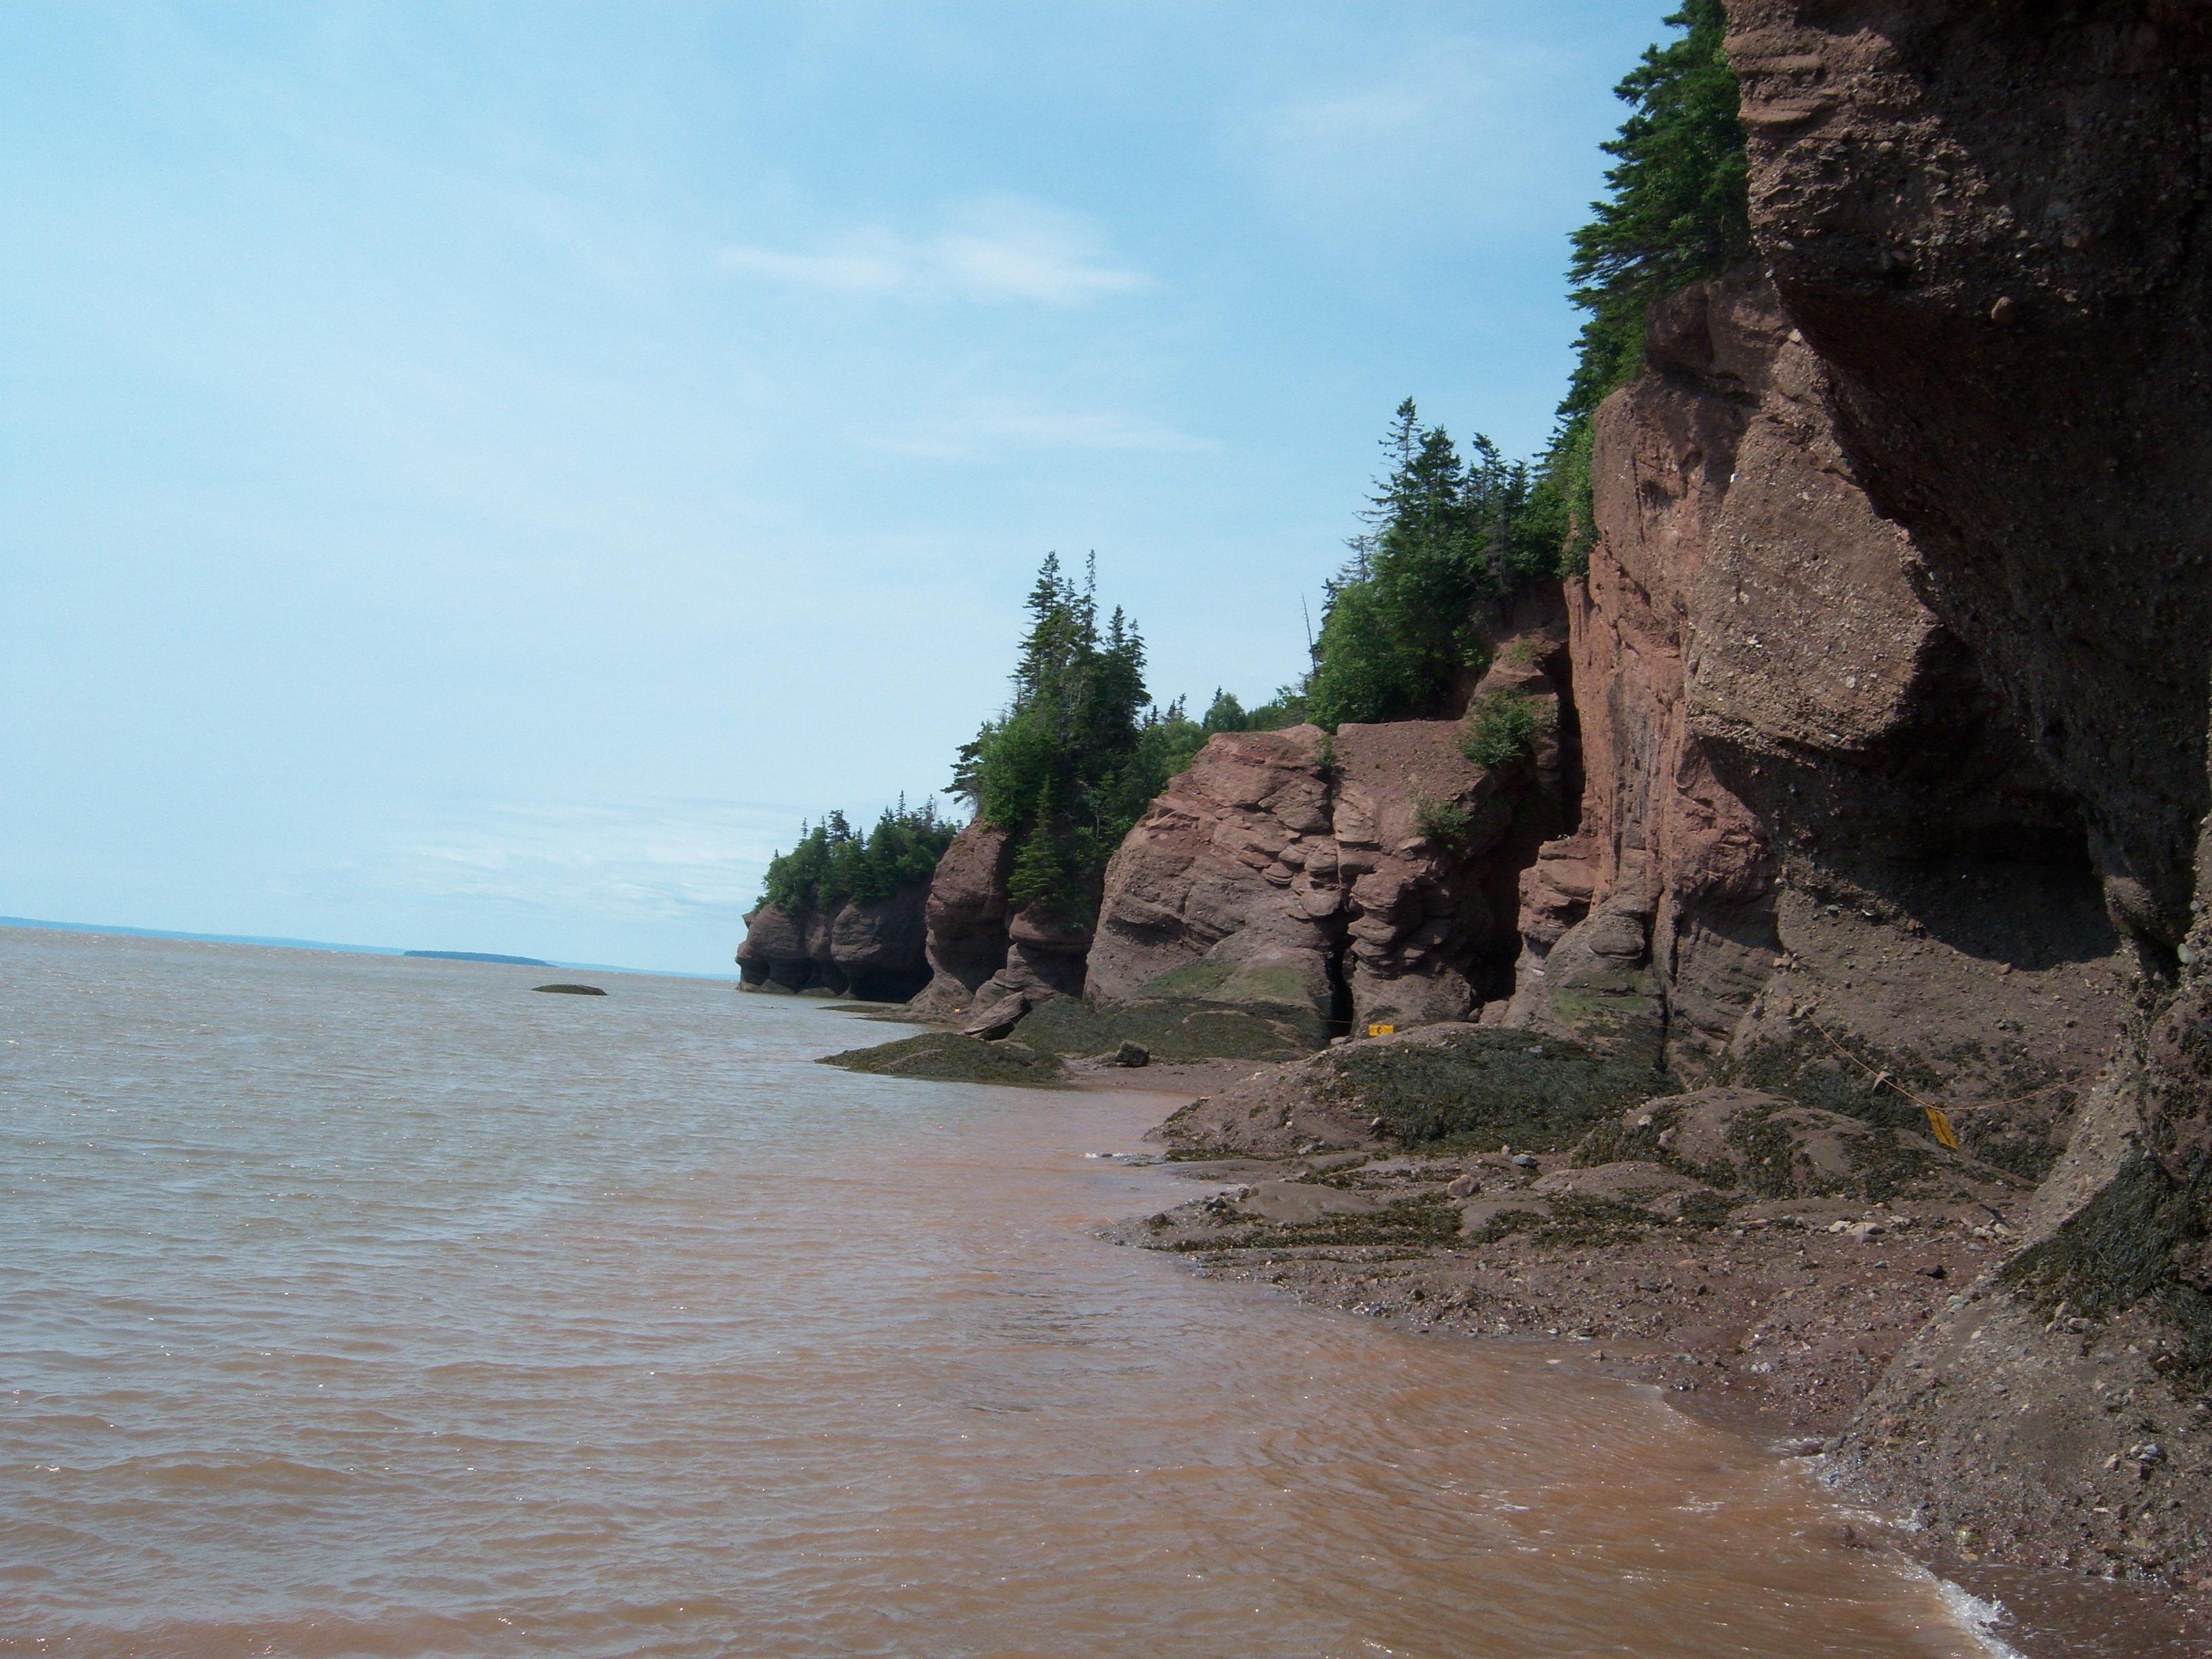 File:Hopewell Rocks Provincial Park . .4.jpg - Wikimedia Commons